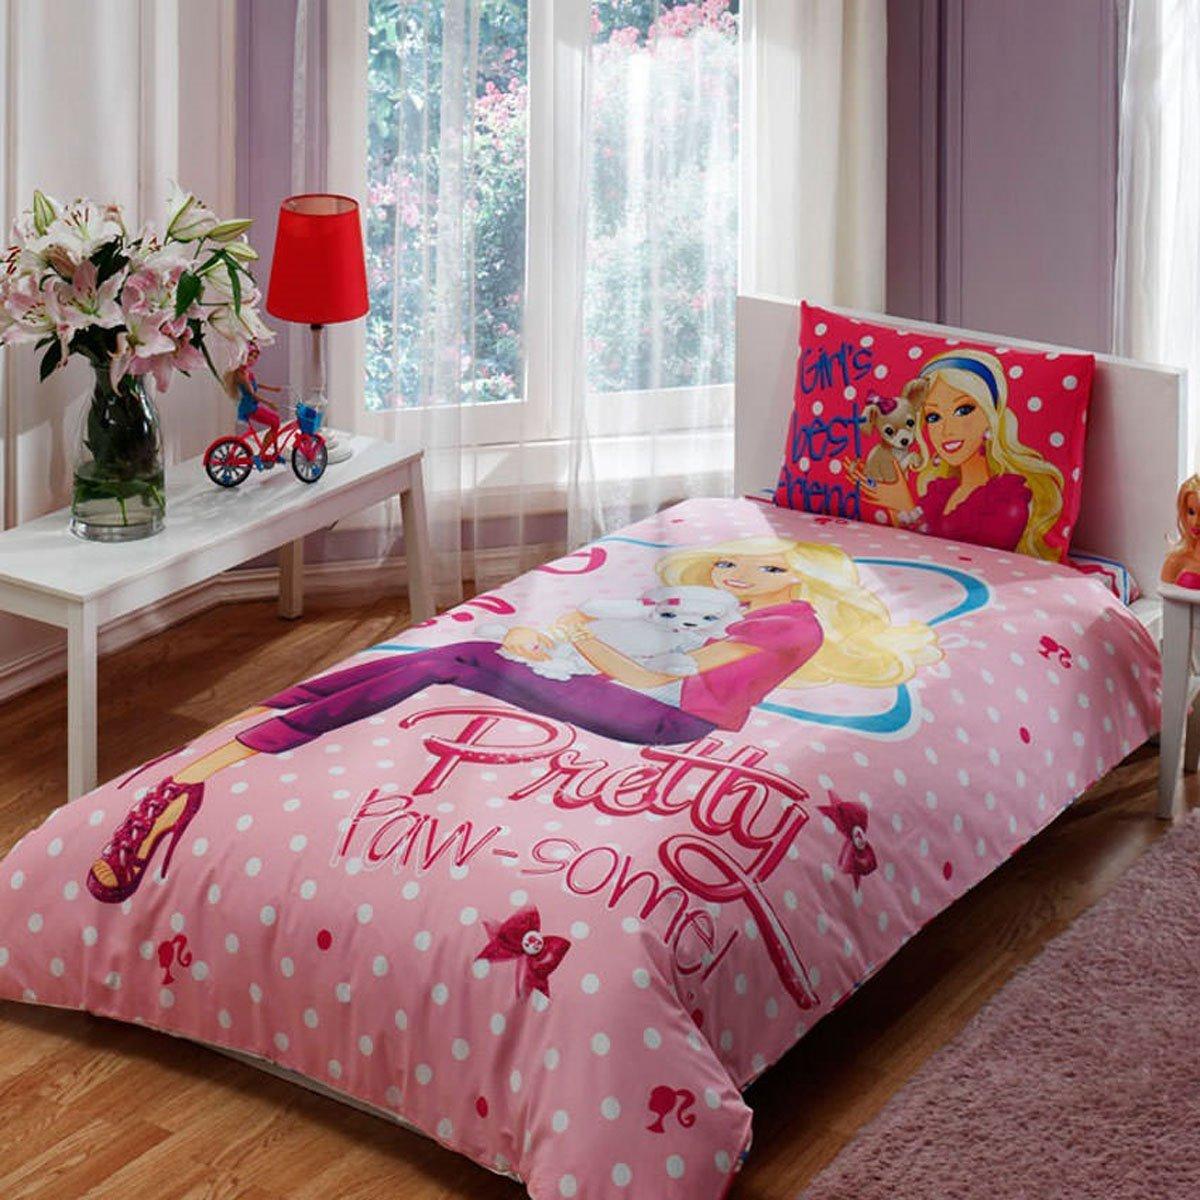 Barbie Pretty, Bedding Duvet Cover Set, Single / Twin